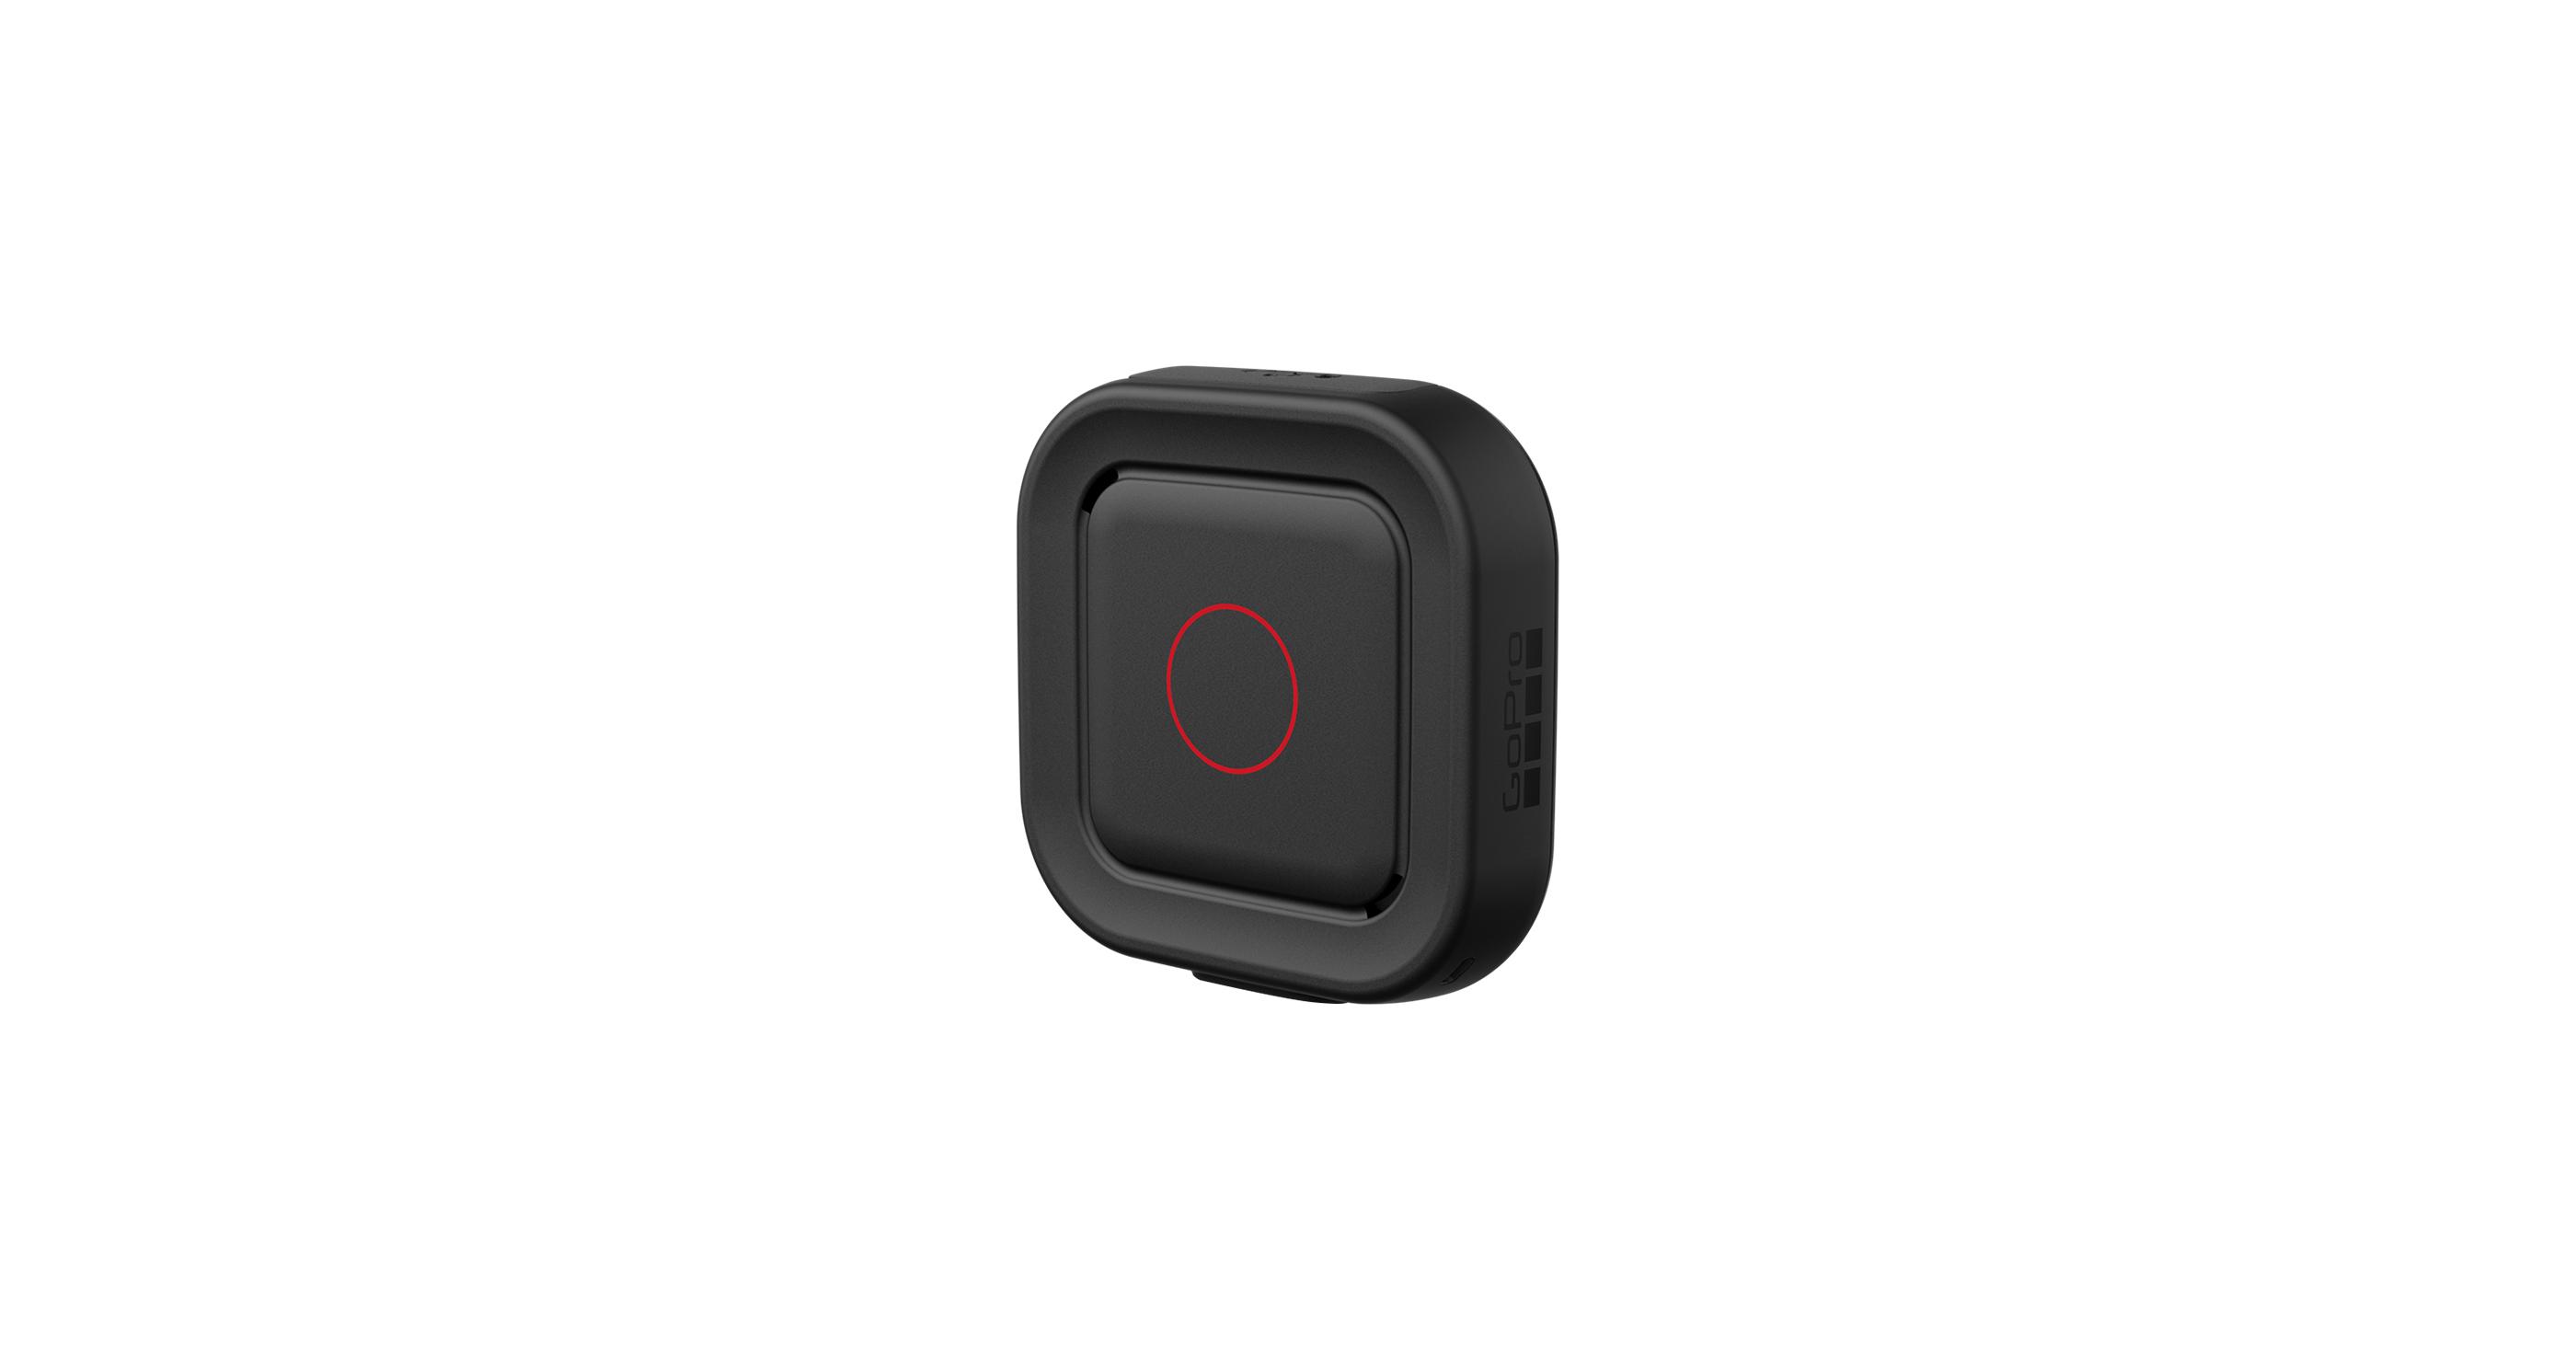 [GoPro] Remo(방수 음성 인식 리모컨) (GO030)